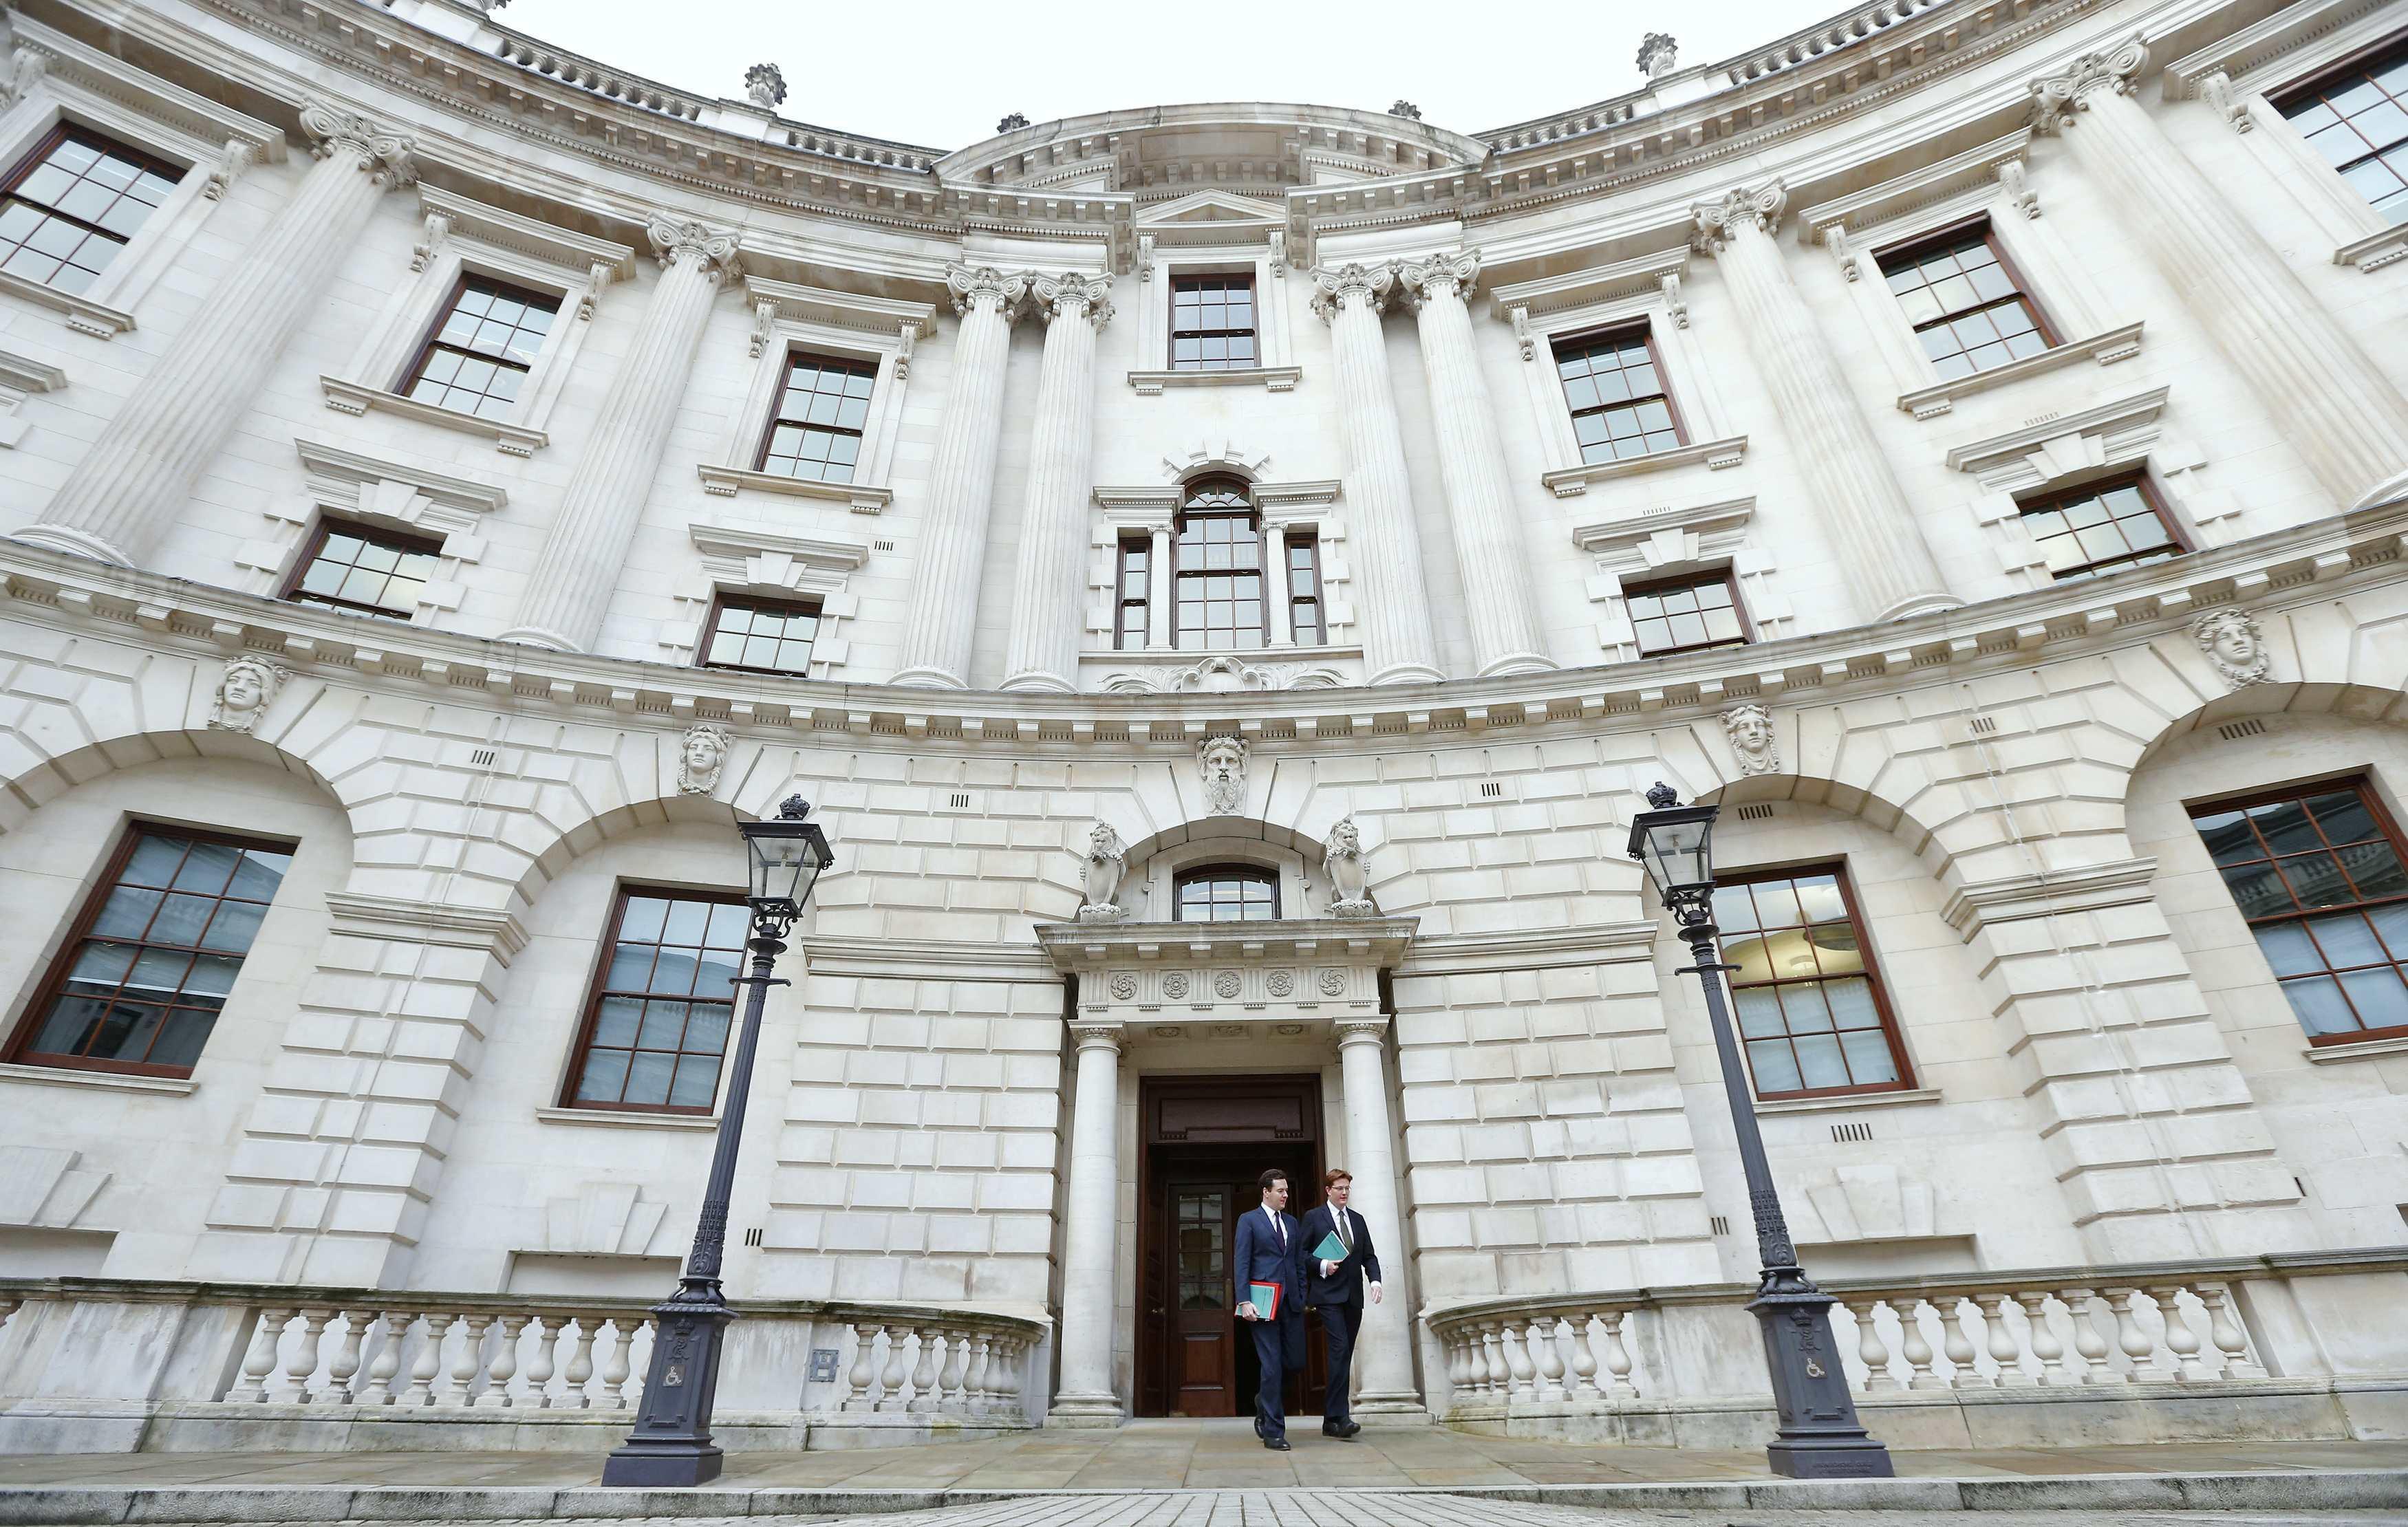 4G auction 'could raise £4billion for Treasury'